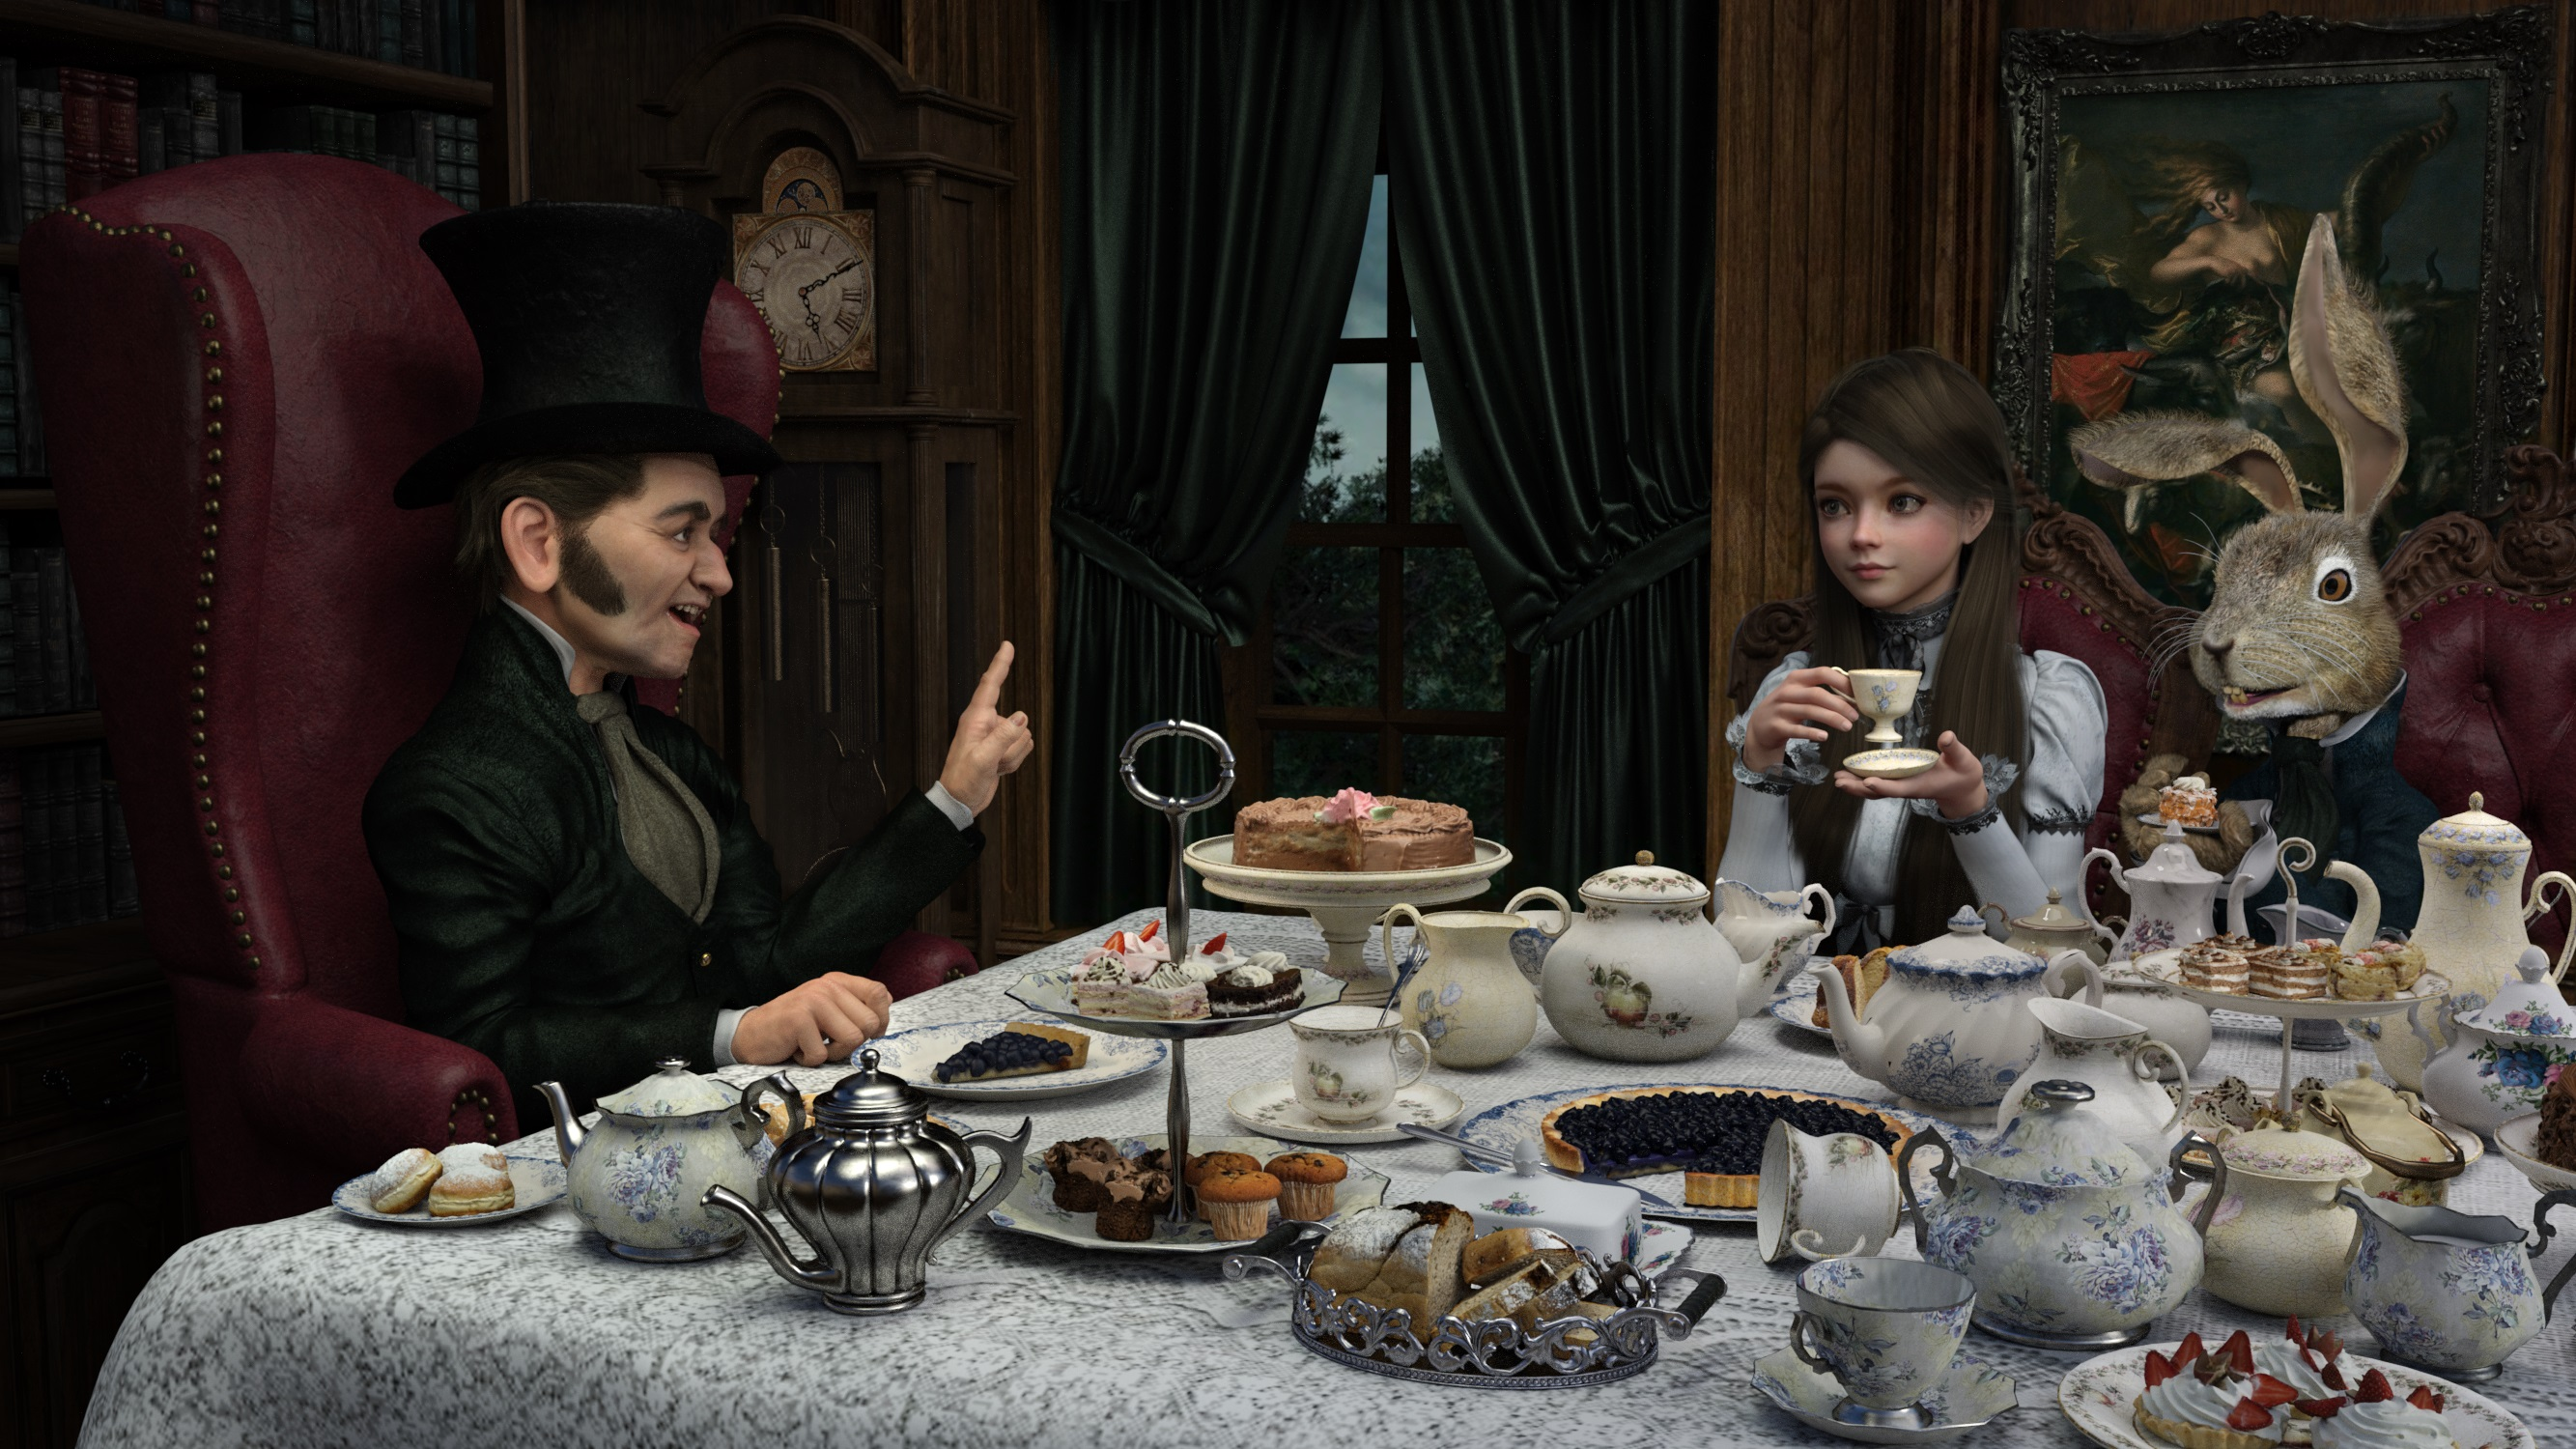 A Victorian Dark Fairytale 005 by SirTancrede